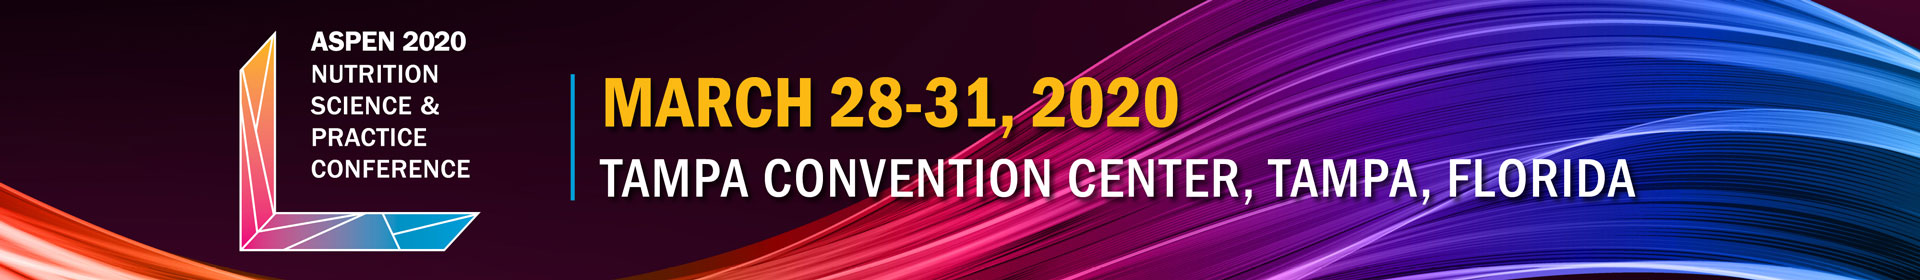 ASPEN20 Event Banner